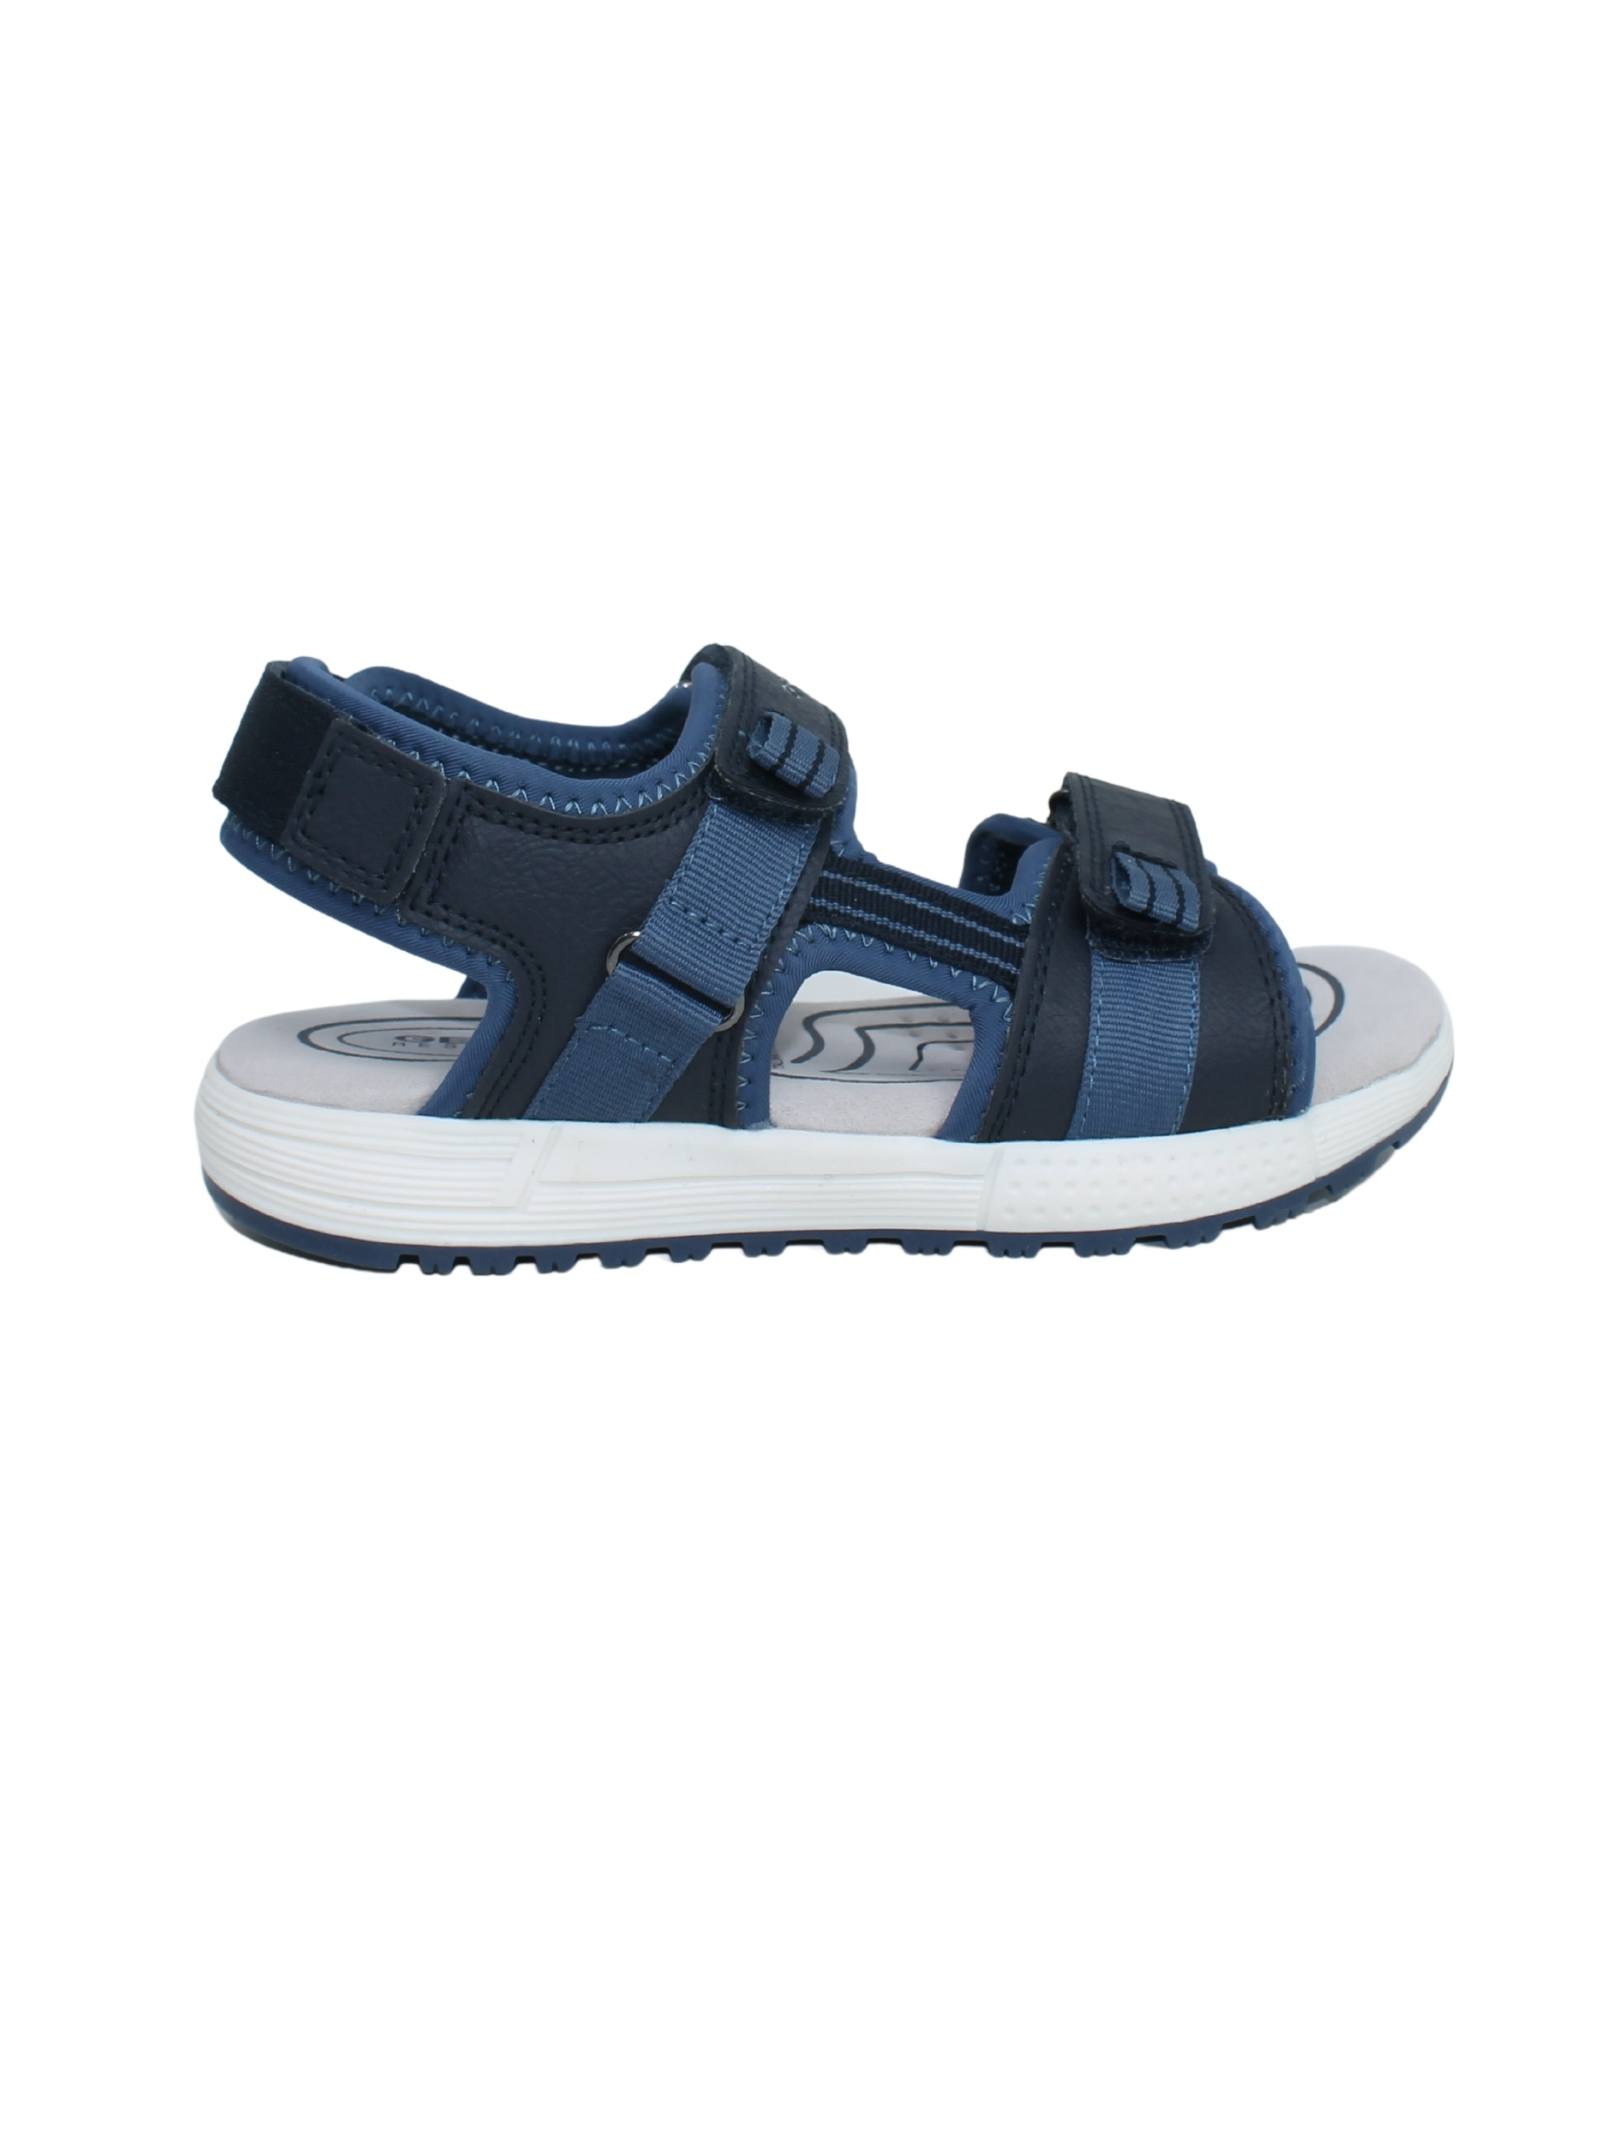 GEOX KIDS | Sandals | J02AVD0FE15C0700